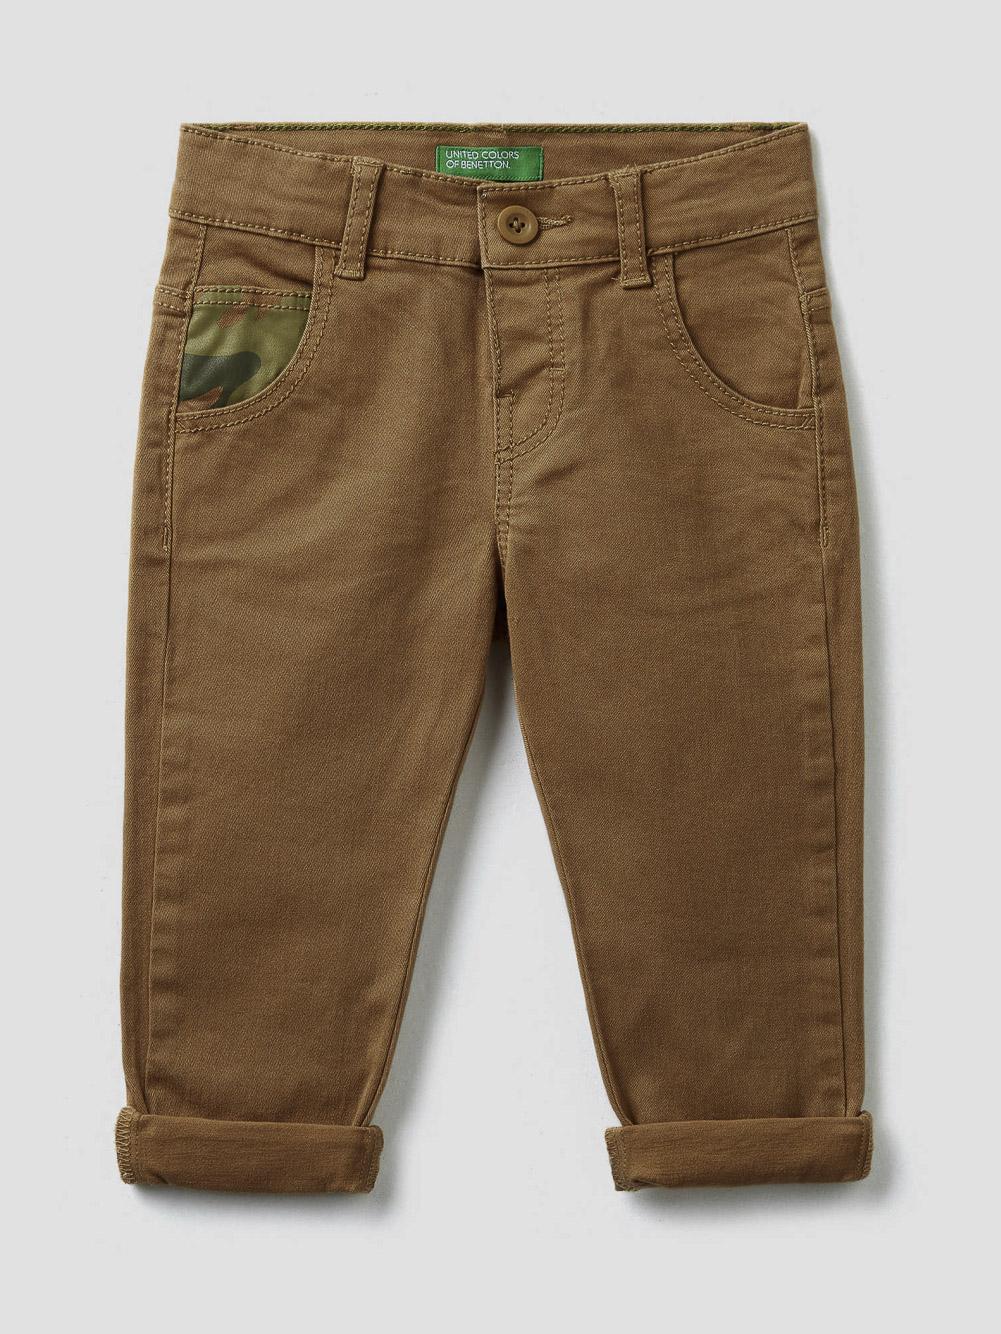 012 BENETTON Παντελόνι με σχέδια 4HM657N20 20A3K1